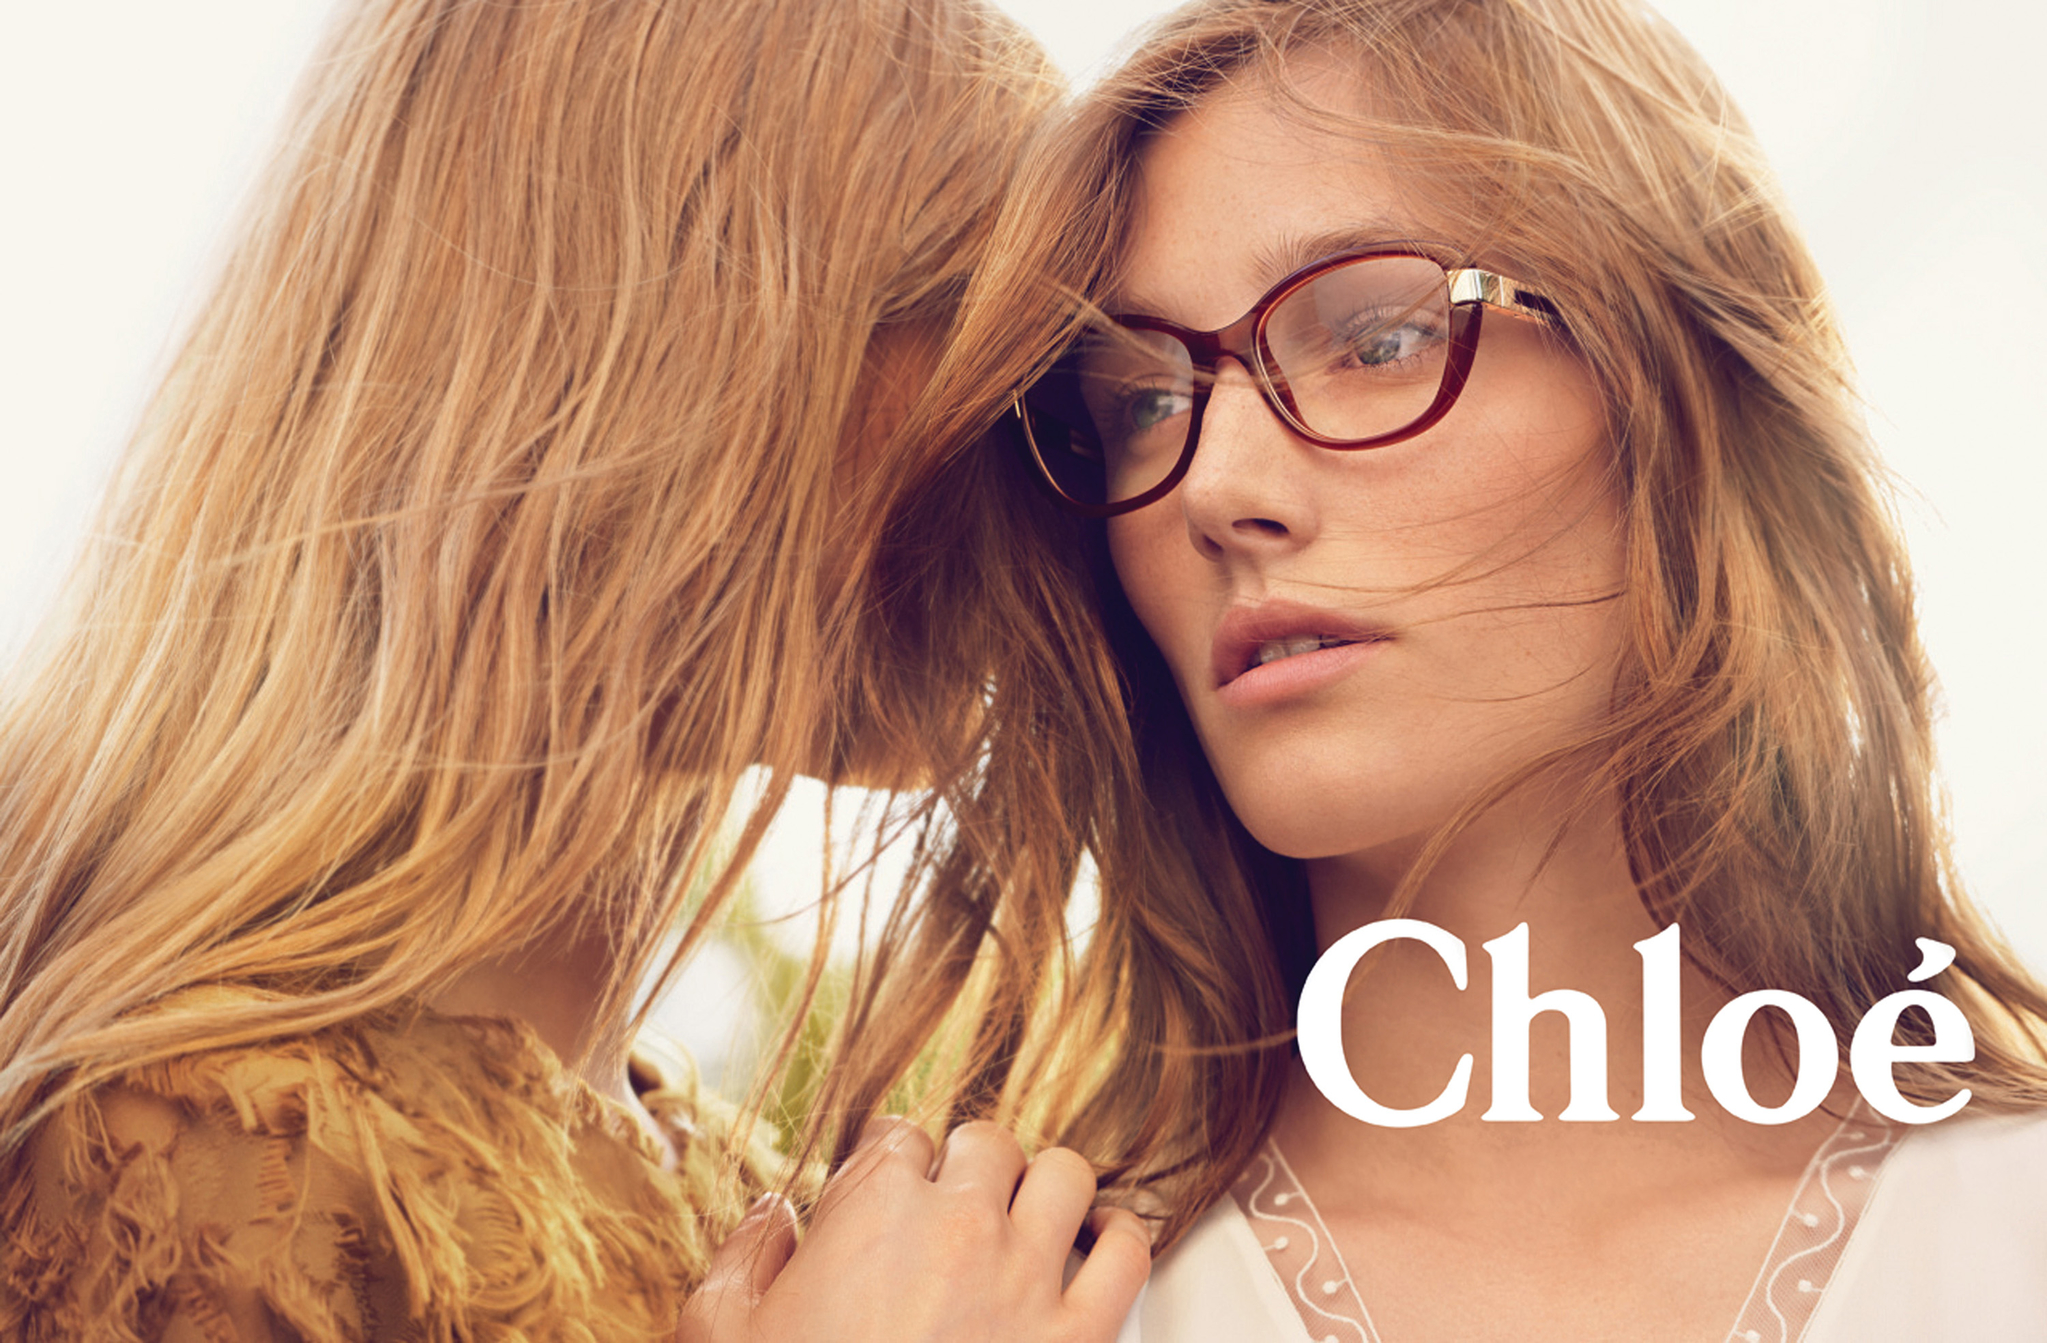 65ea2fbf3f415 Chloé Eyewear - Art Partner